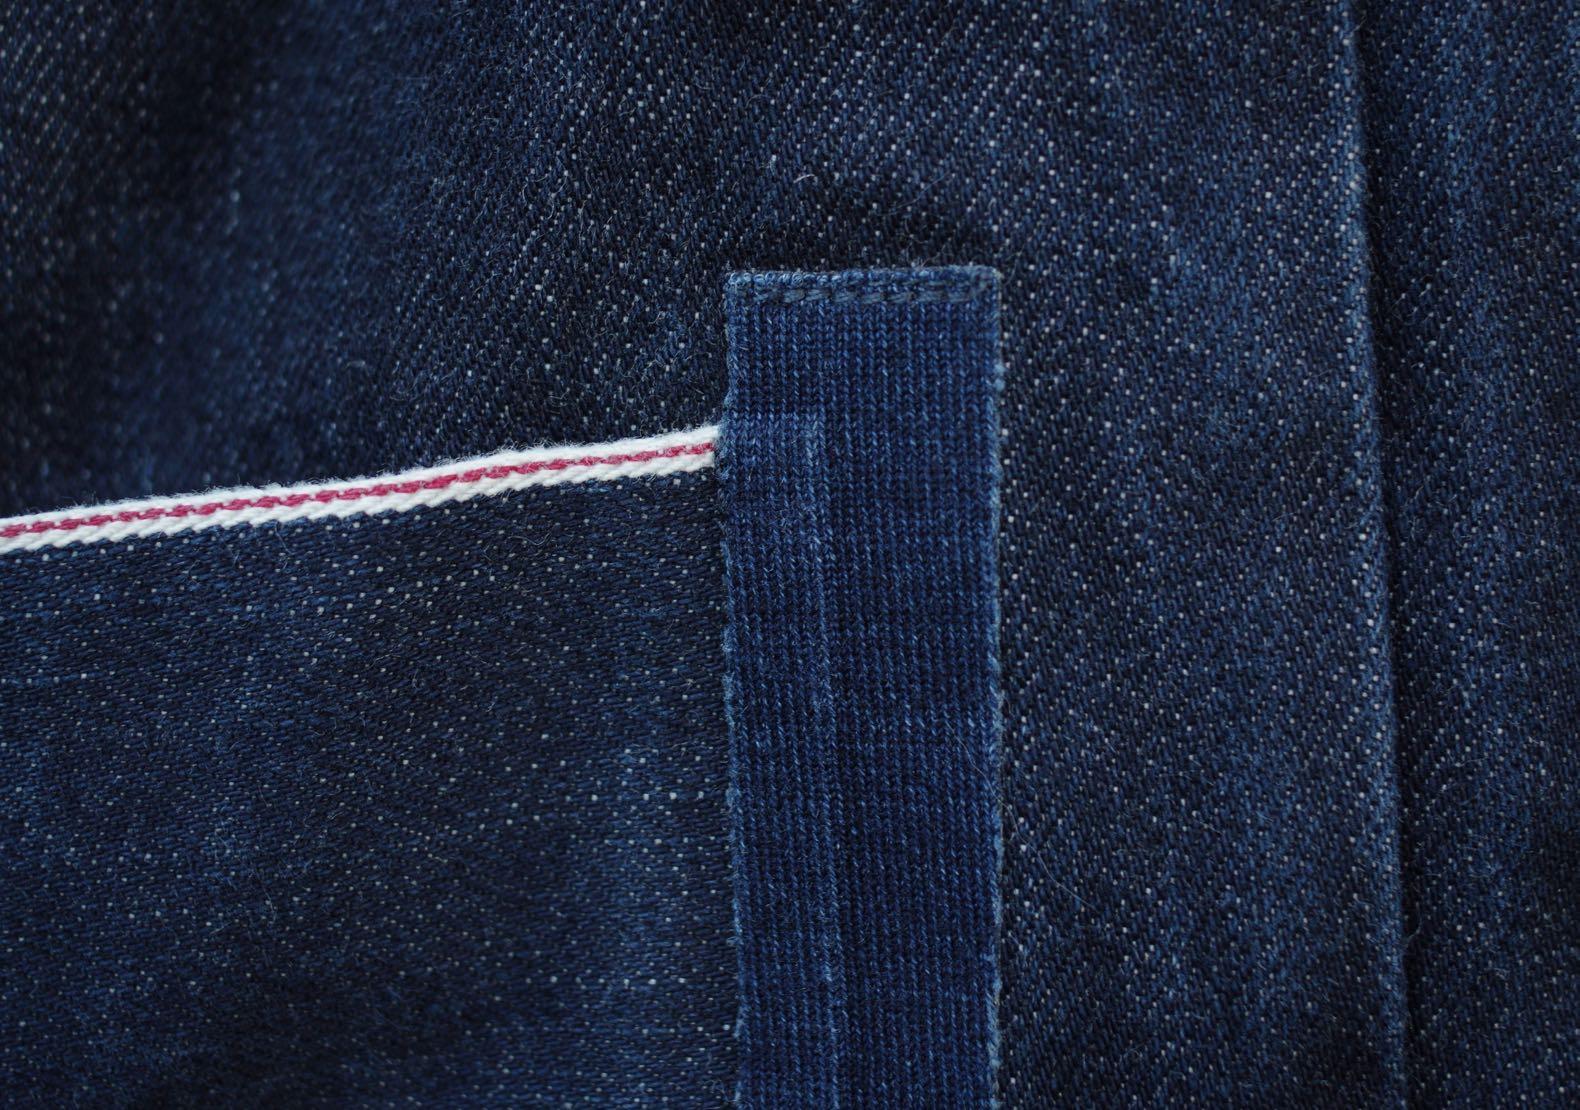 liseret selvedge d'une poche en denim modèle Iki Phi Denim